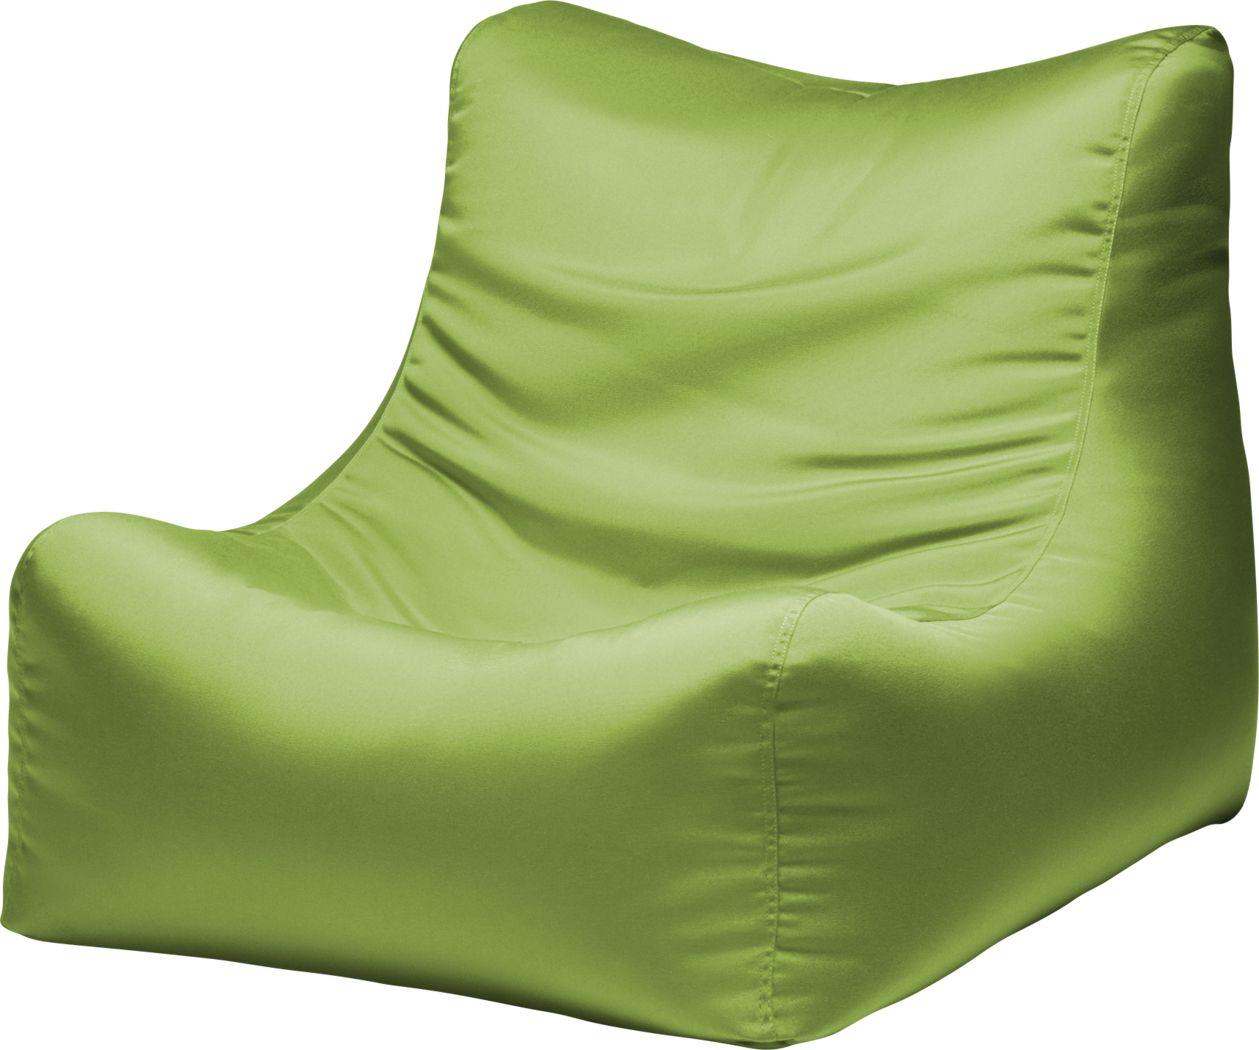 Kids Chatty Garden Green Indoor/Outdoor Bean Bag Chair